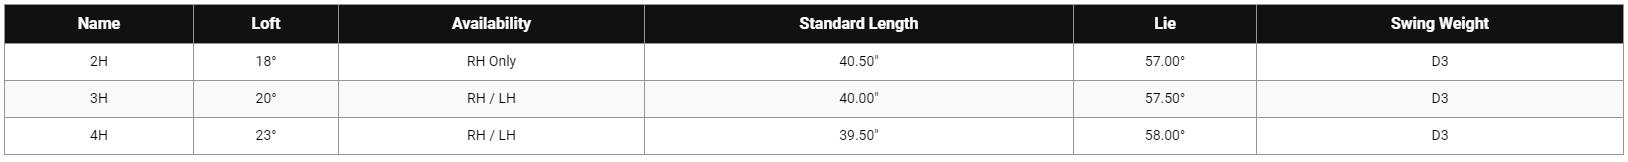 Callaway Mavrik Pro Hybrid Tech Specs